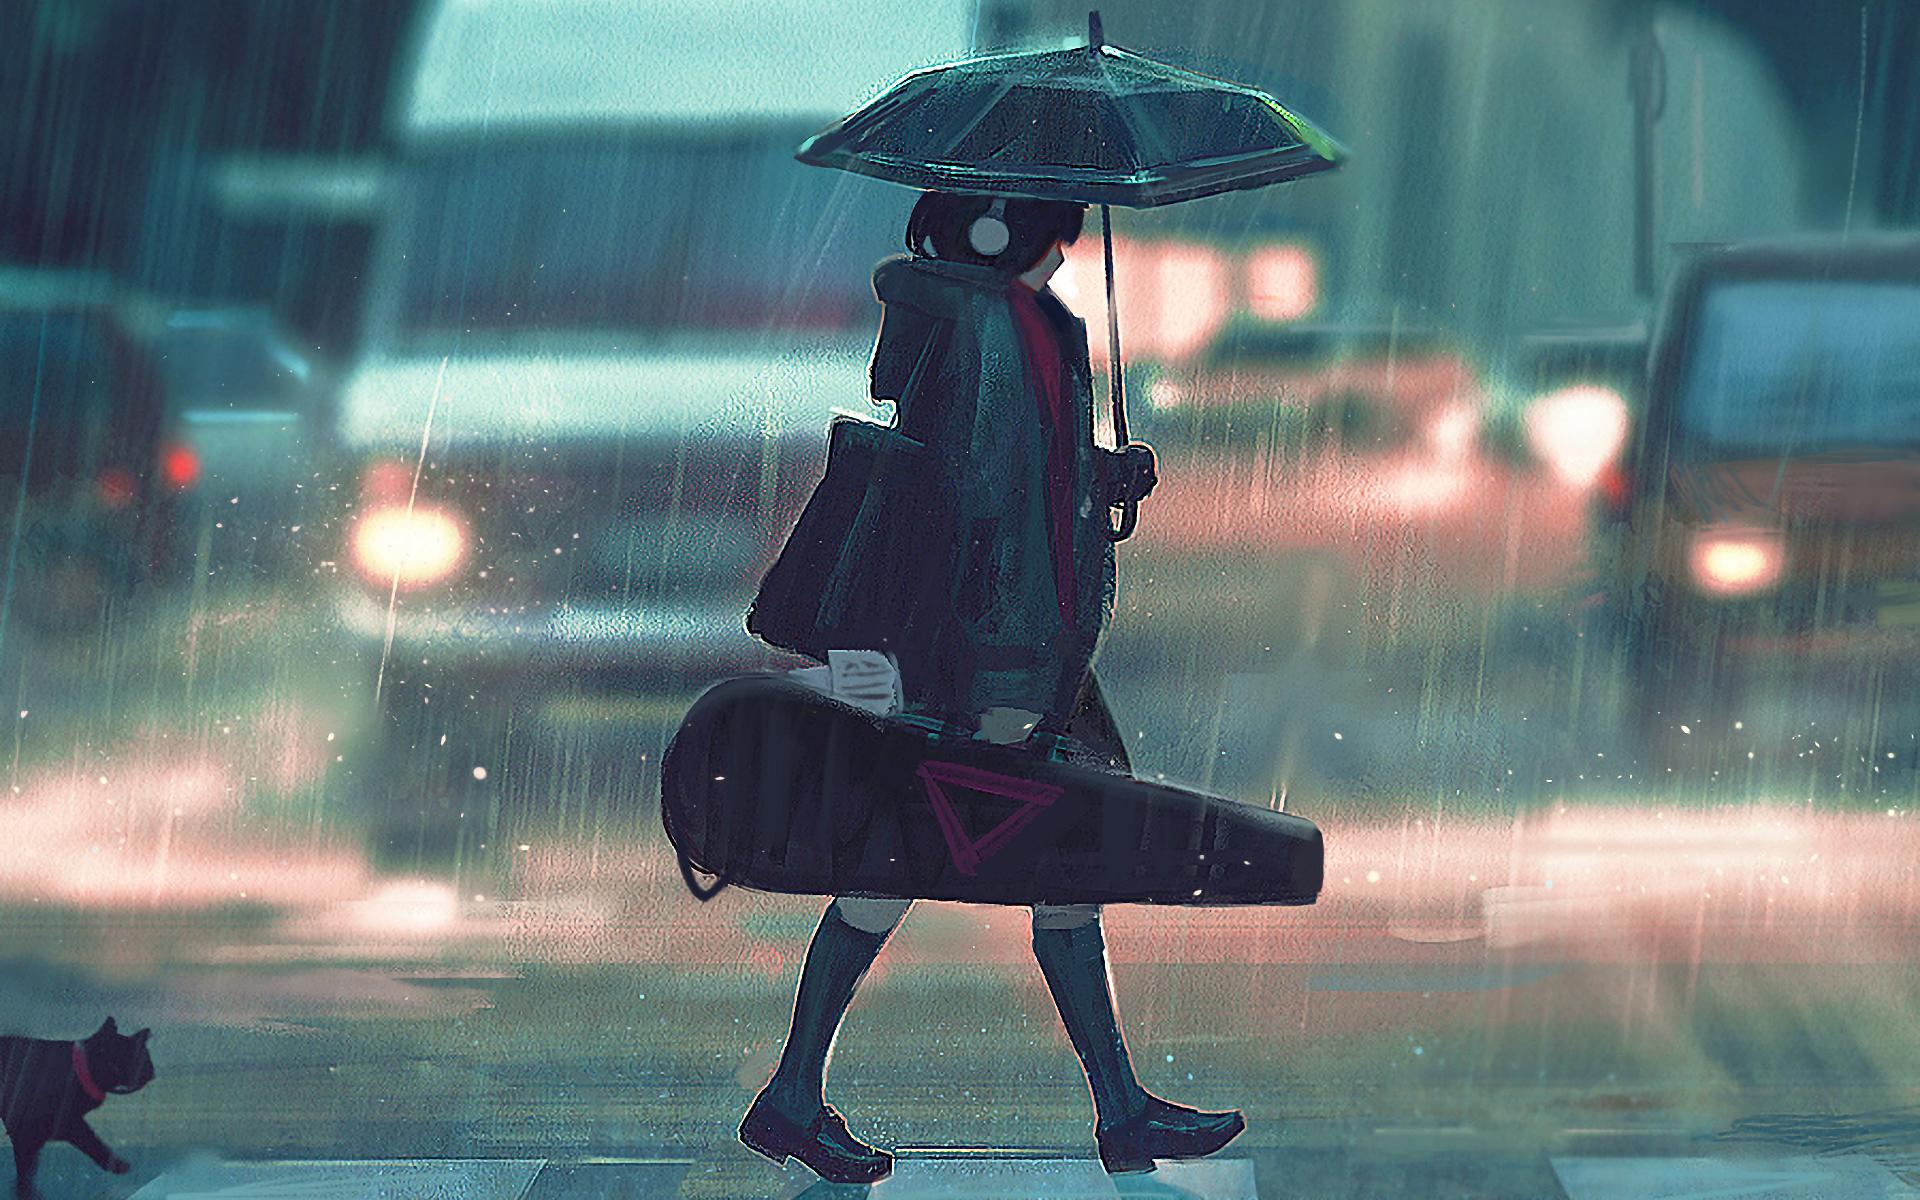 anime girl wallpaper,umbrella,rain,fashion accessory,photography,precipitation